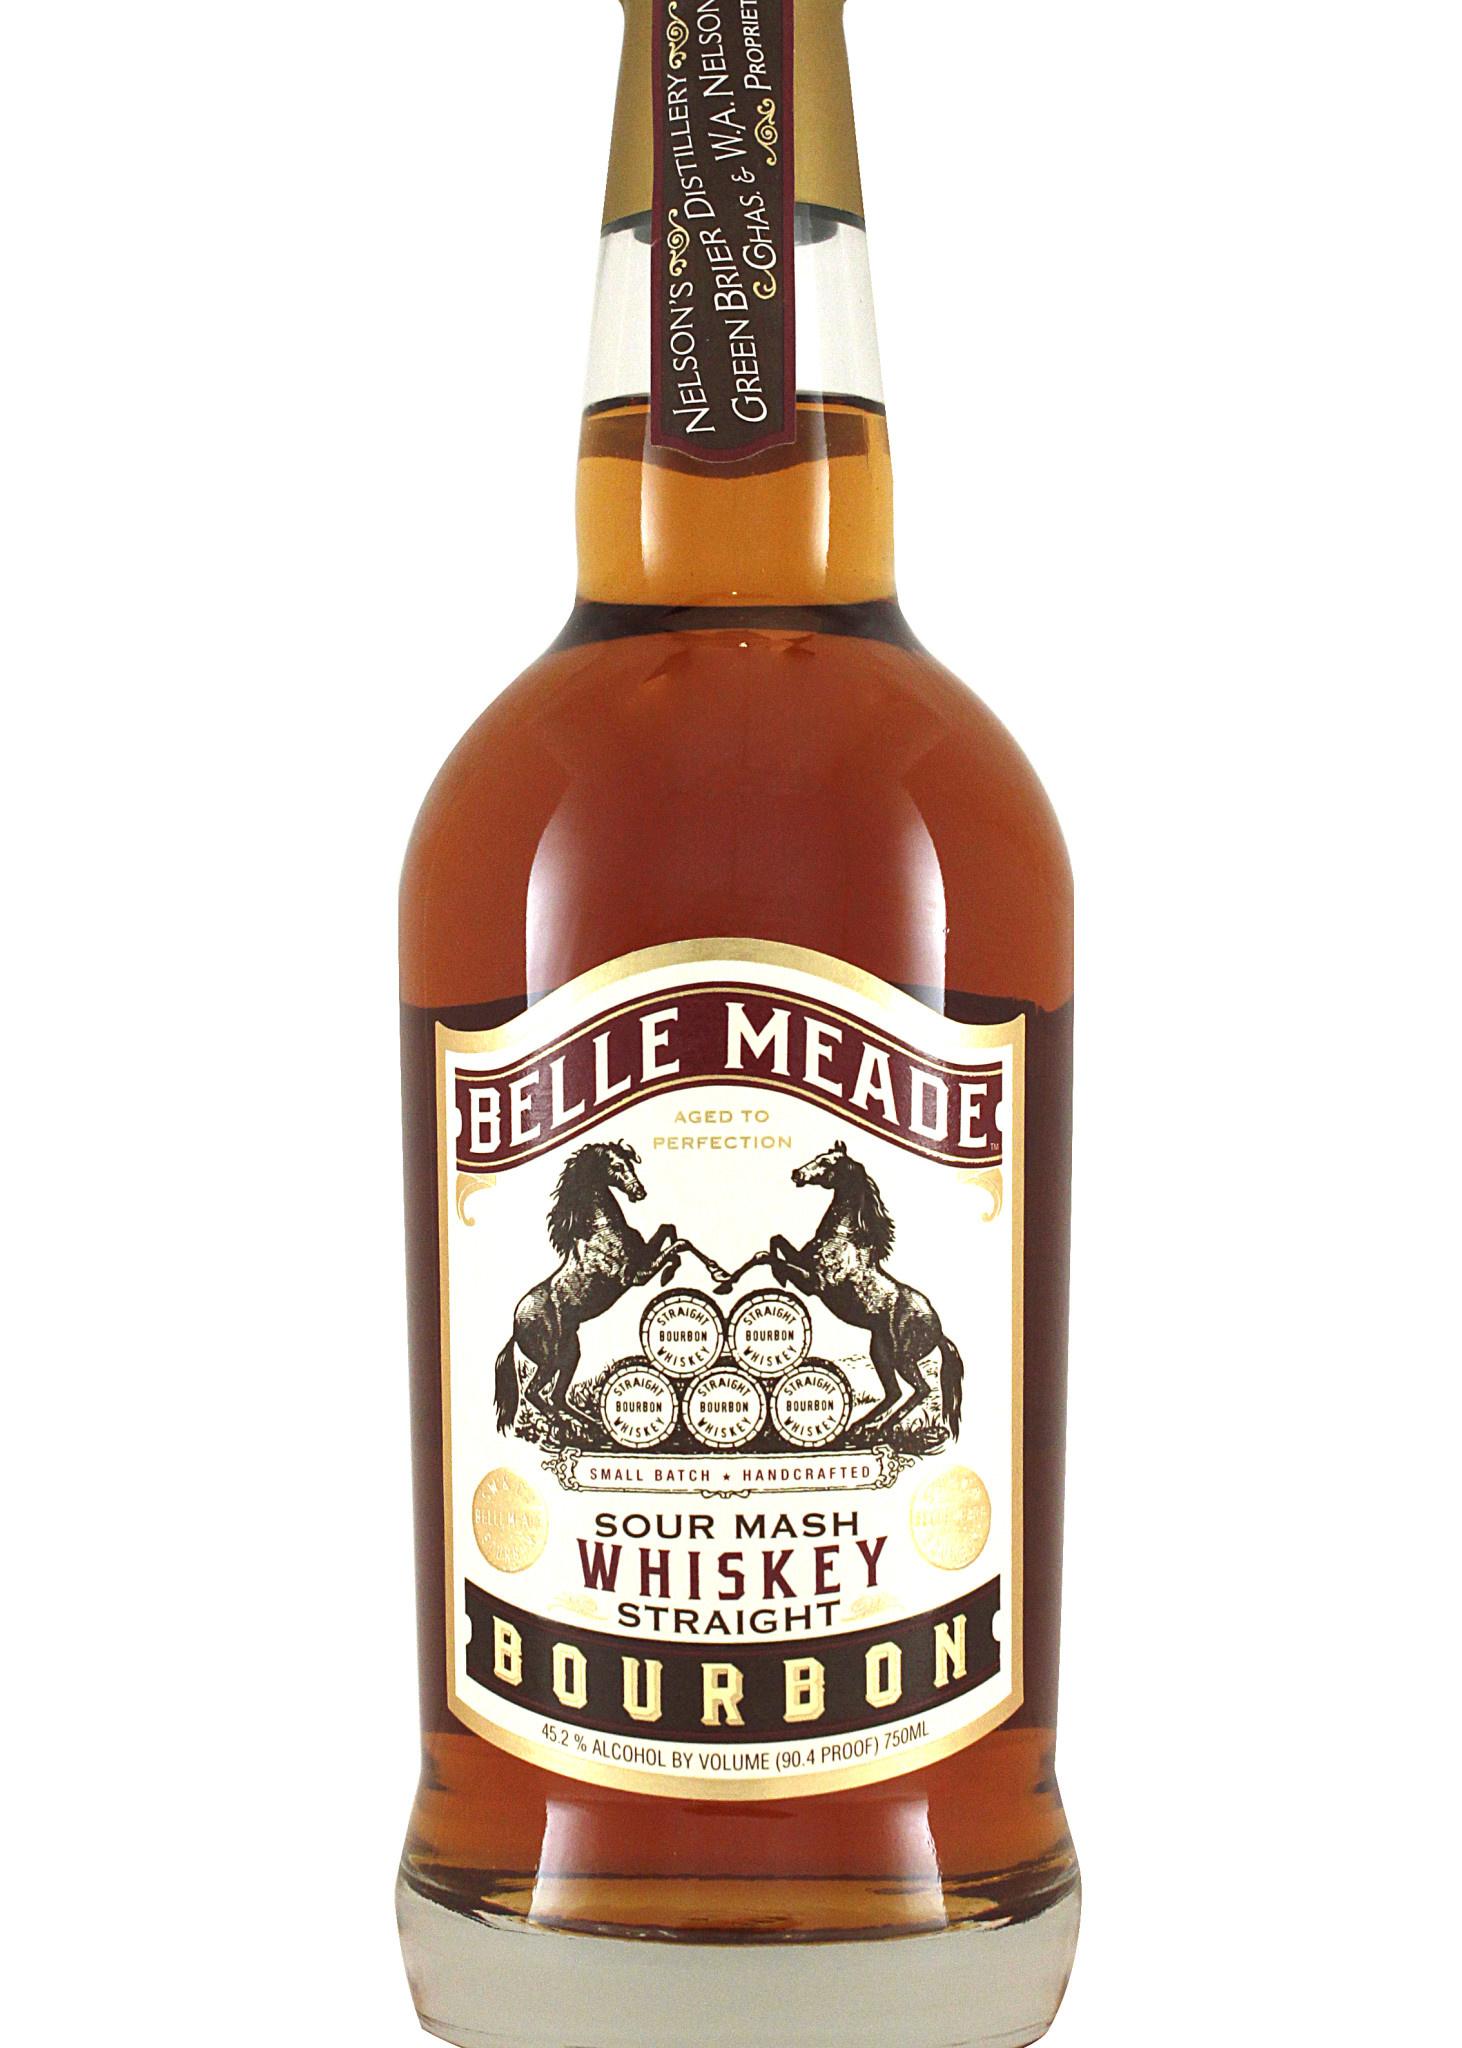 Belle Meade Sour Mash Straight Bourbon Whiskey, Nashville, Tennessee